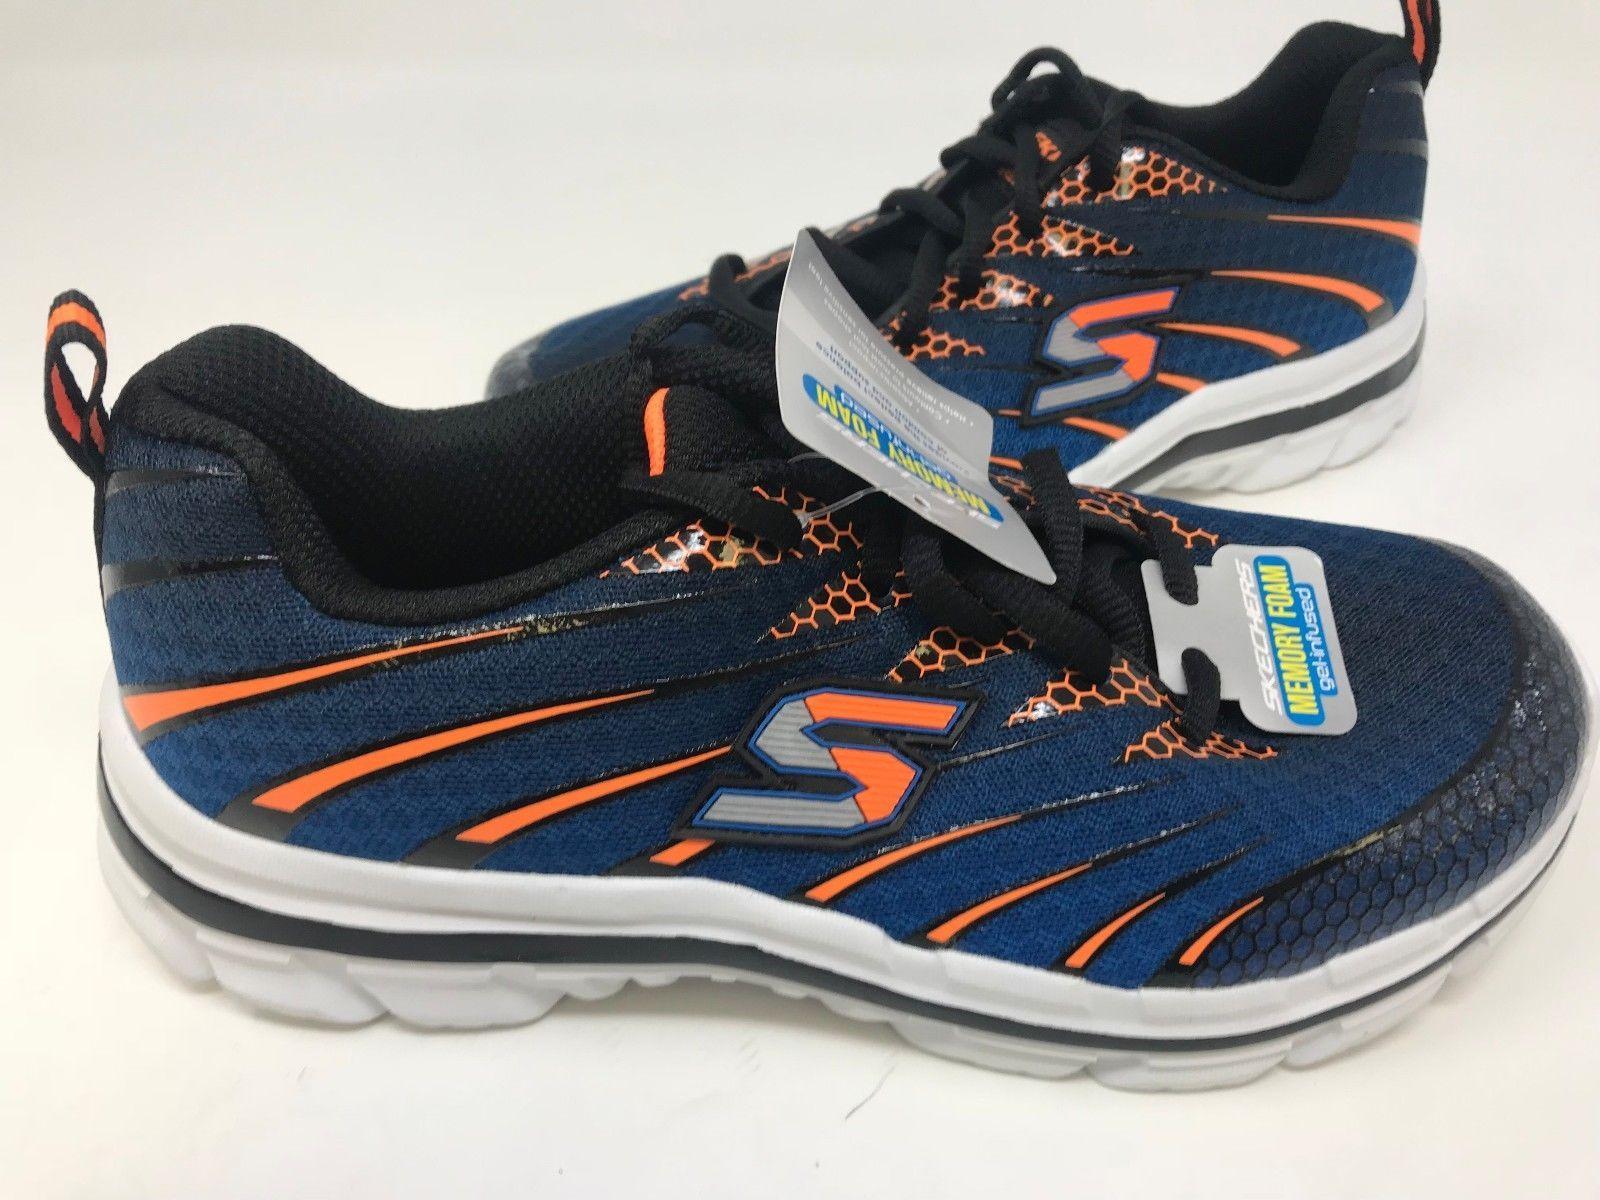 289e70c0a082 Skechers Youth Boy s Nitrat Shoes Blue Orange  95340L 172E lz (eBay Link)